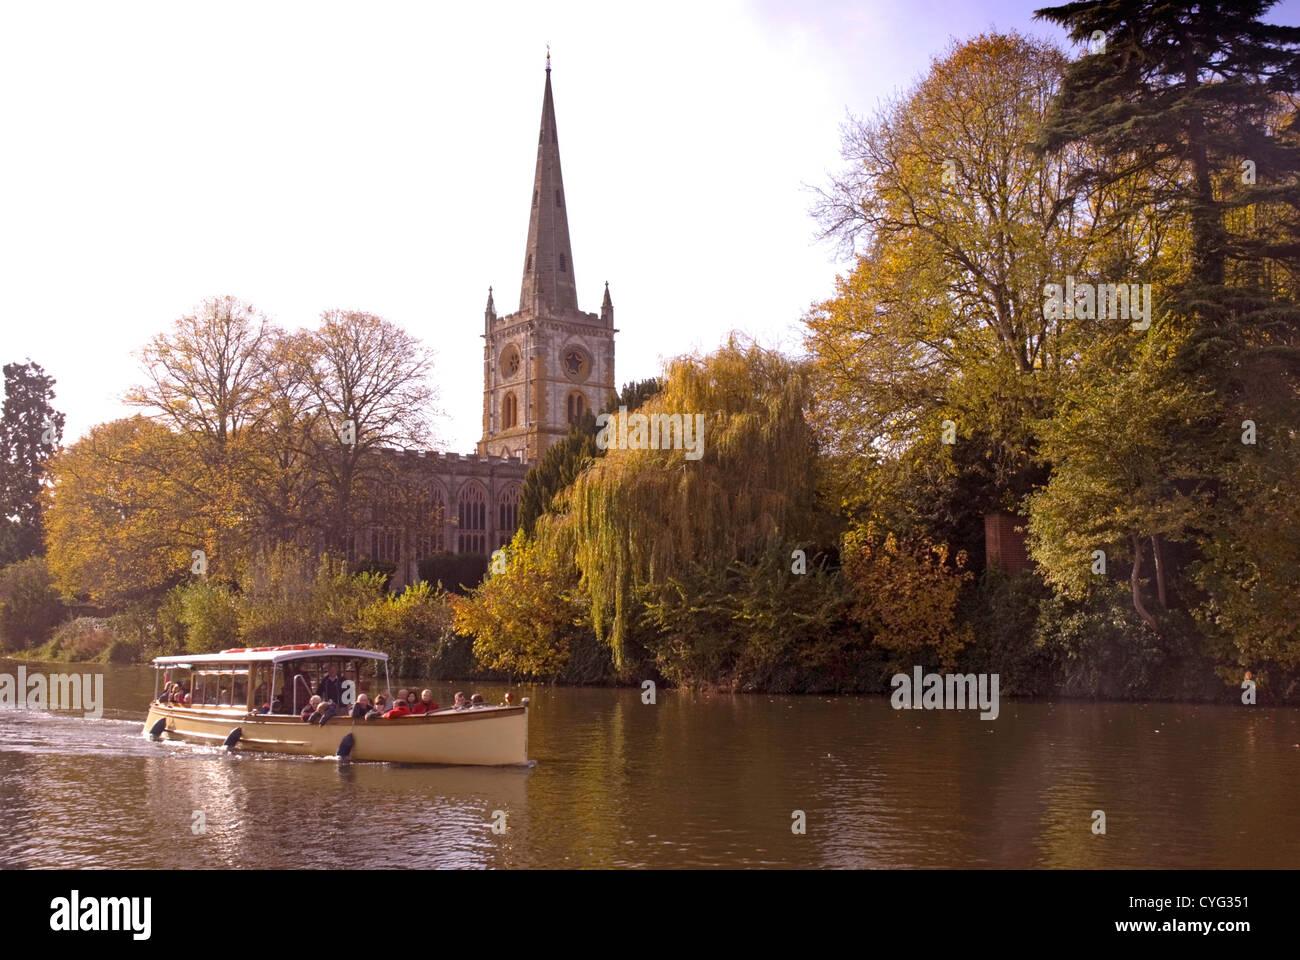 Warwickshire Stratford upon Avon - river scene - tourist river cruise - backdrop Holy Trinity church - autumn colours - Stock Image